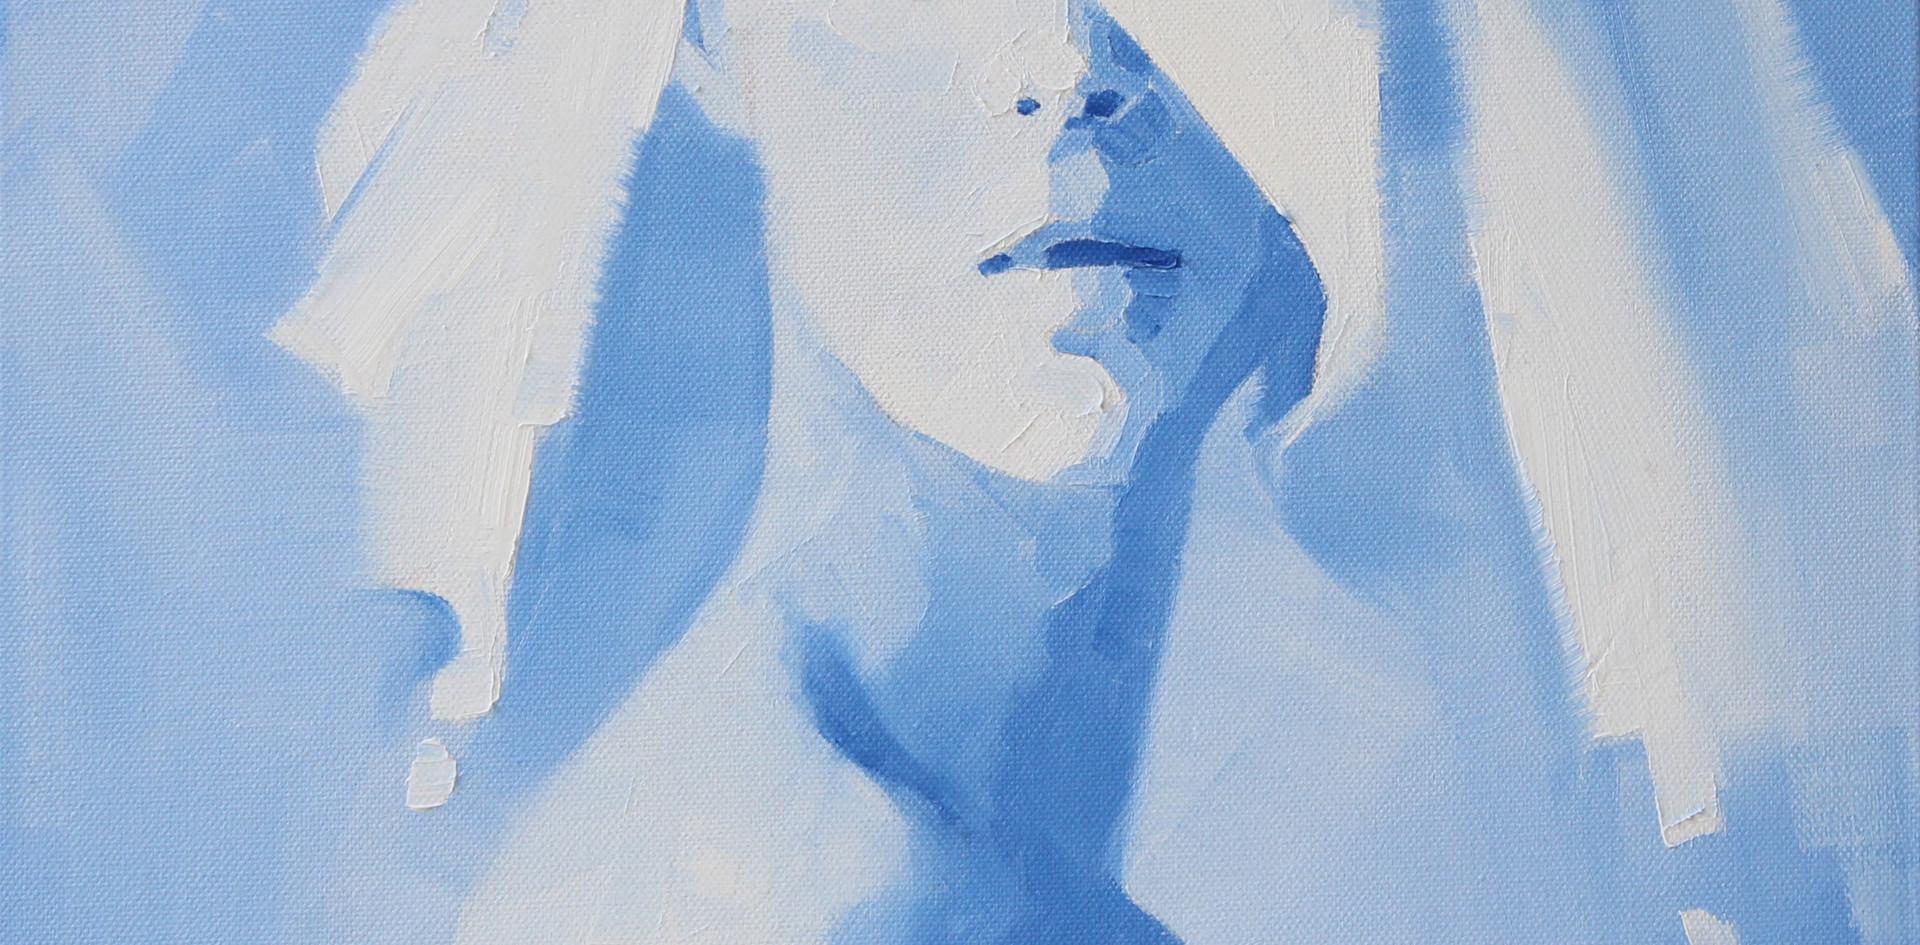 Heaven Blue